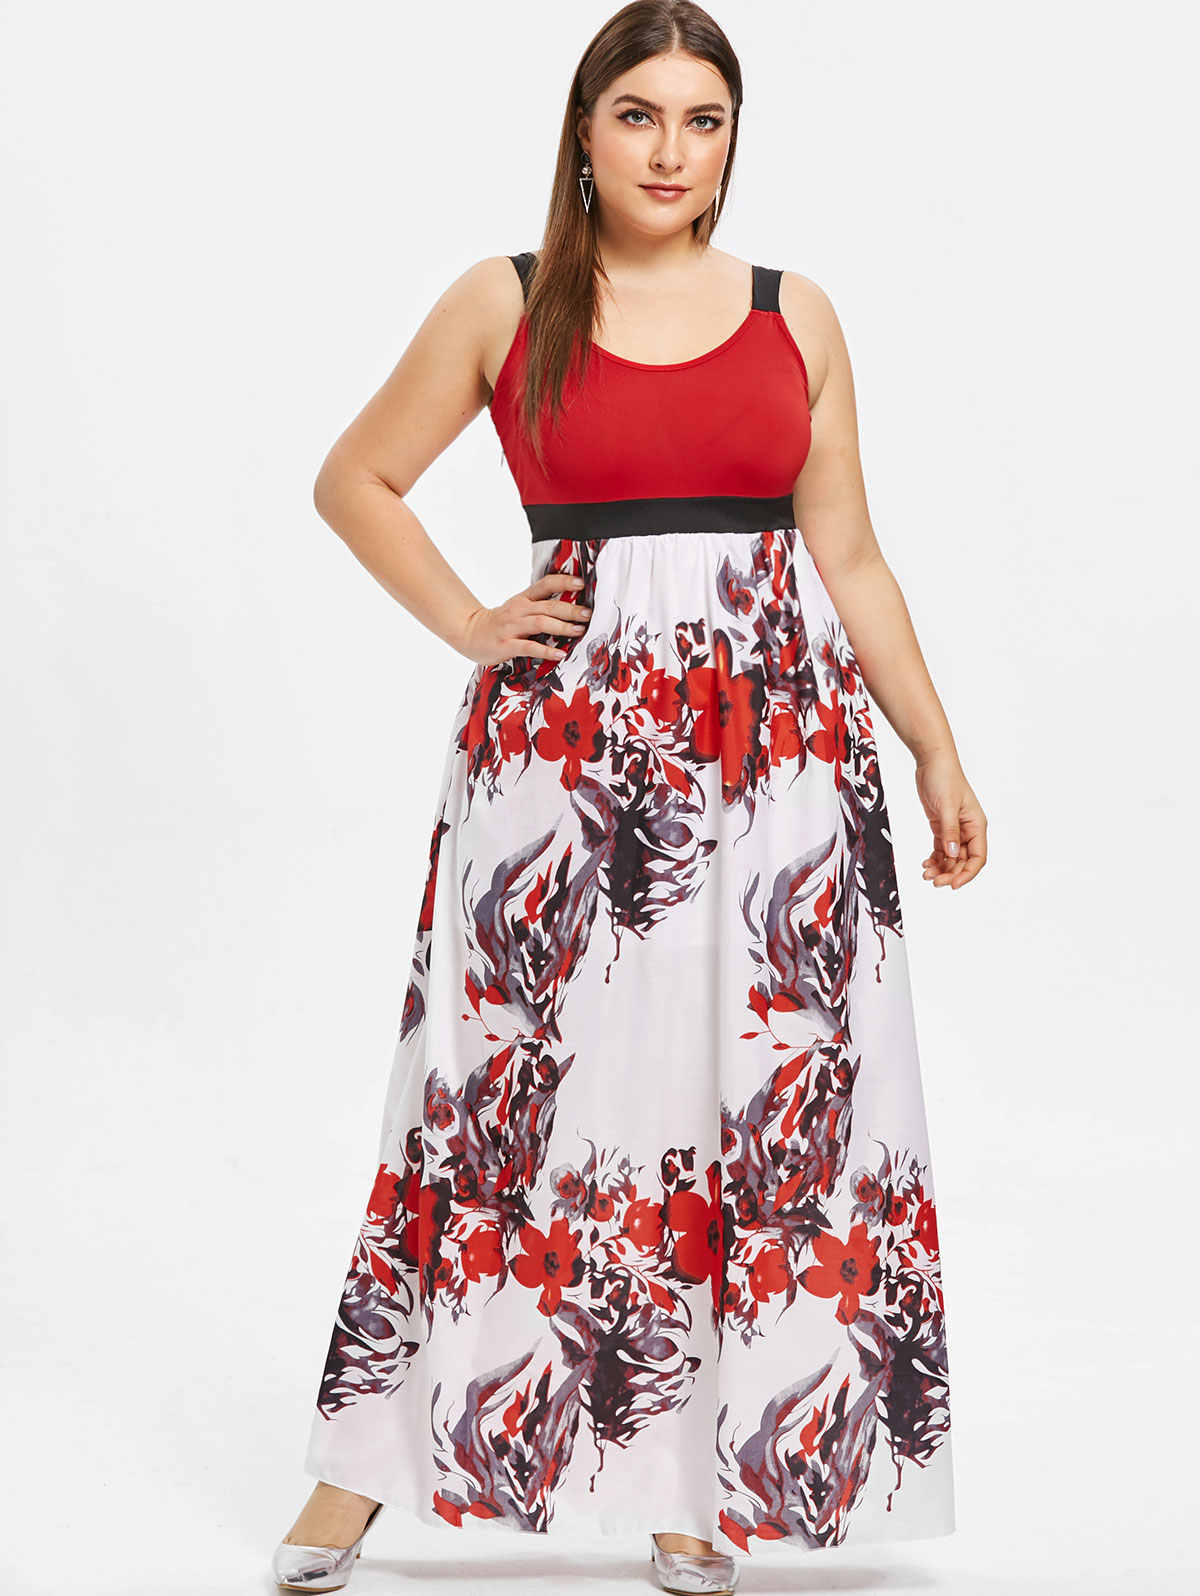 Wipalo Floral Print Plus Size Maxi